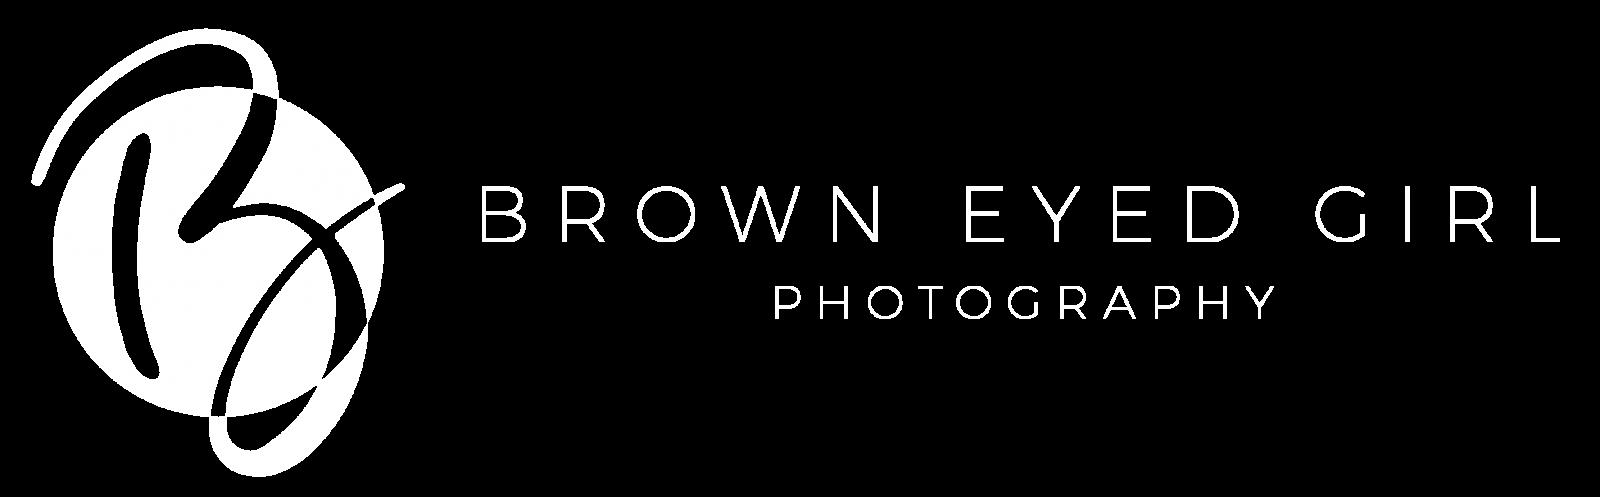 Brown-eyed-girl-photography-horizontal-white